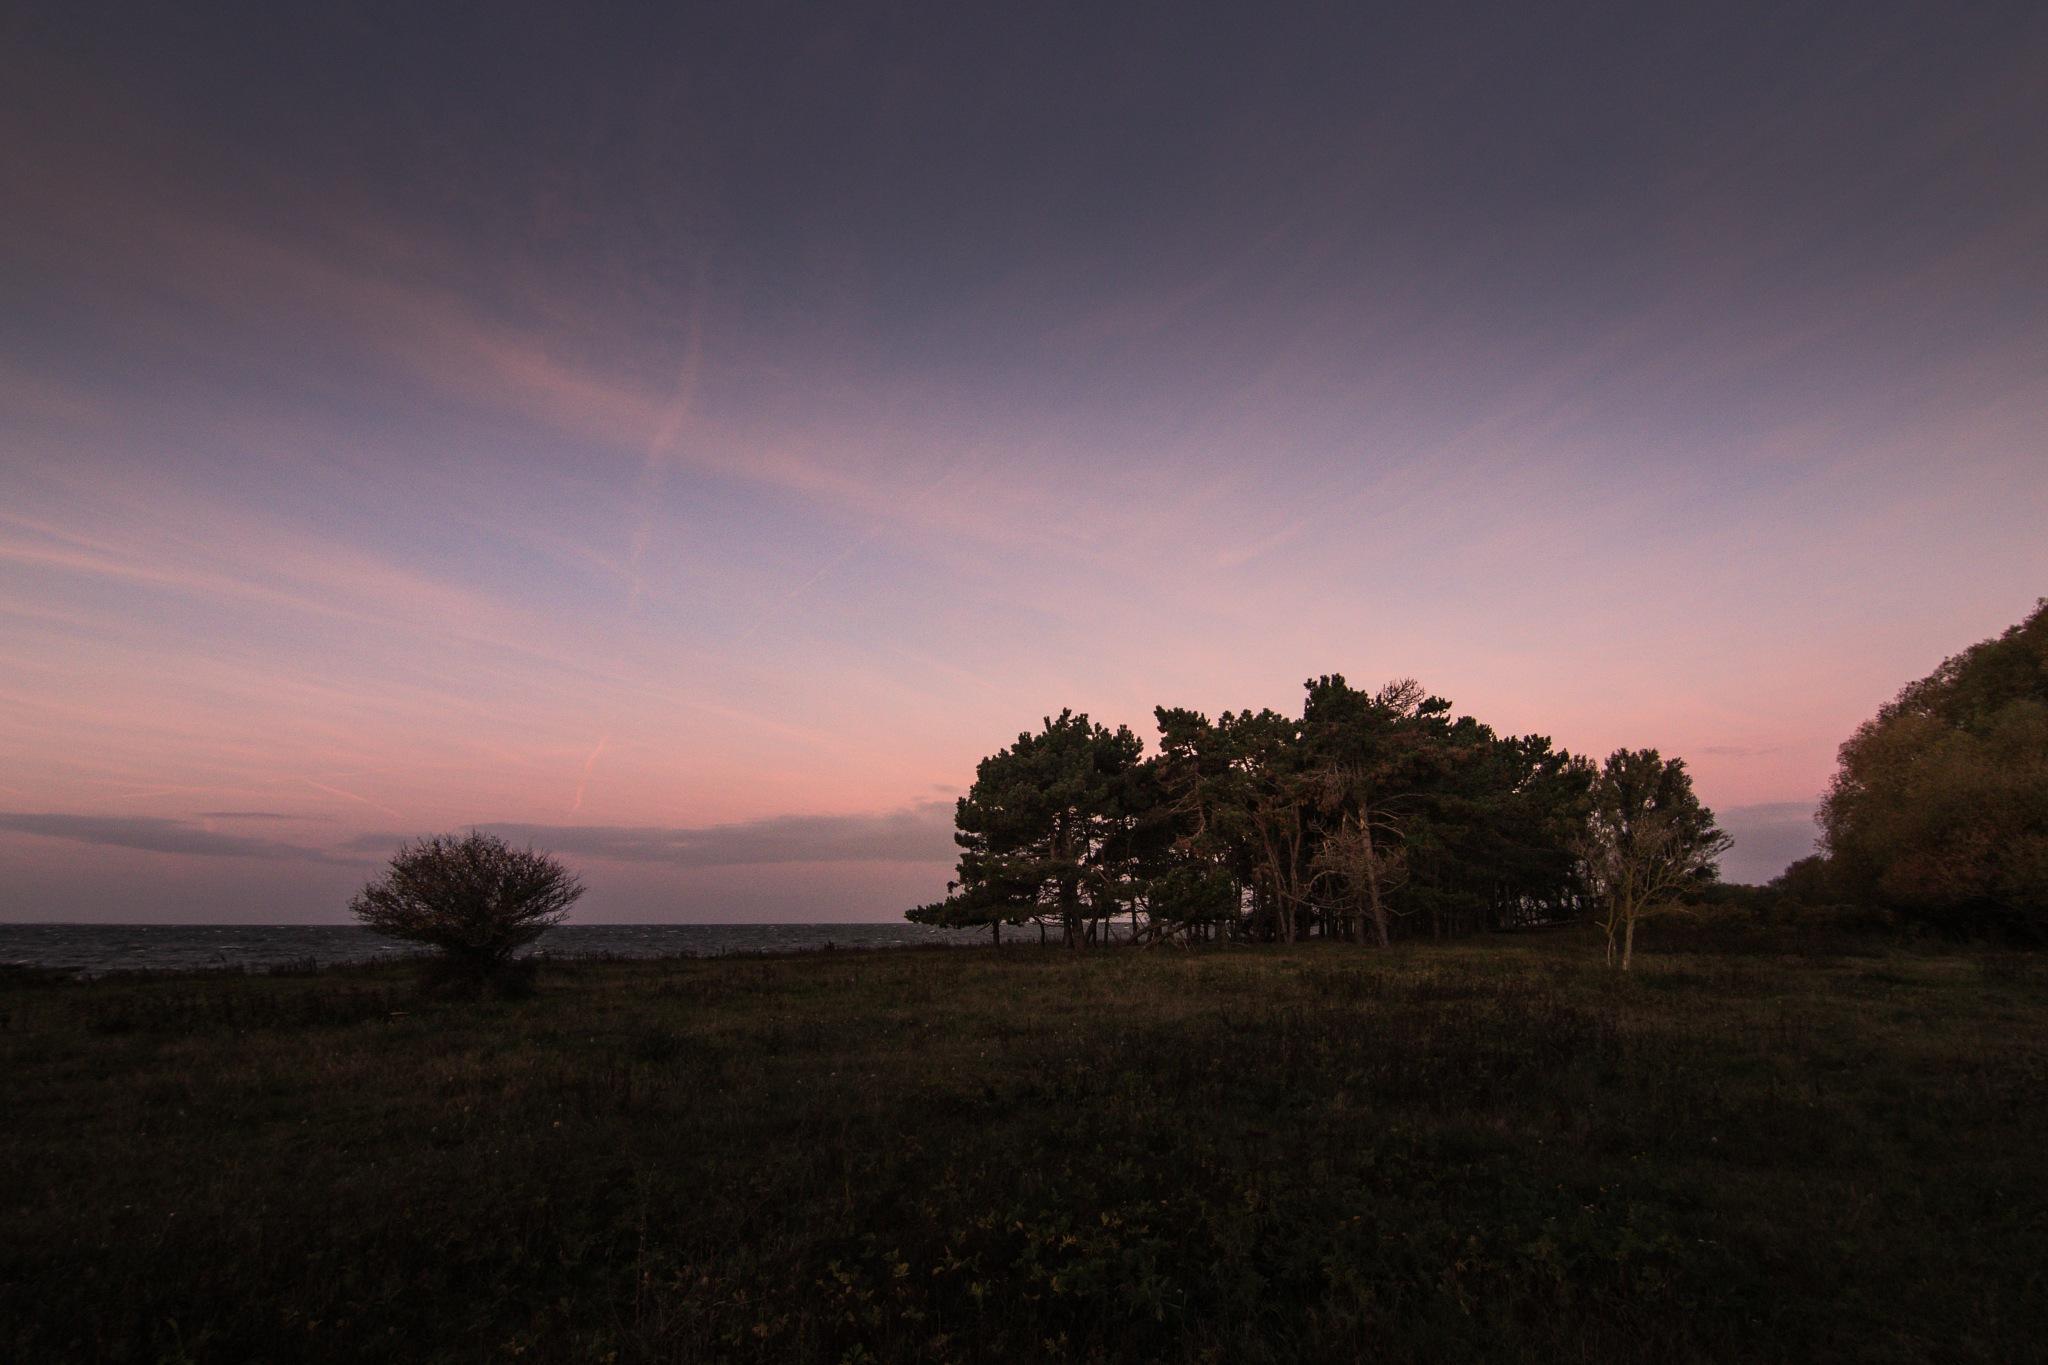 Morning light by Michael B. Rasmussen